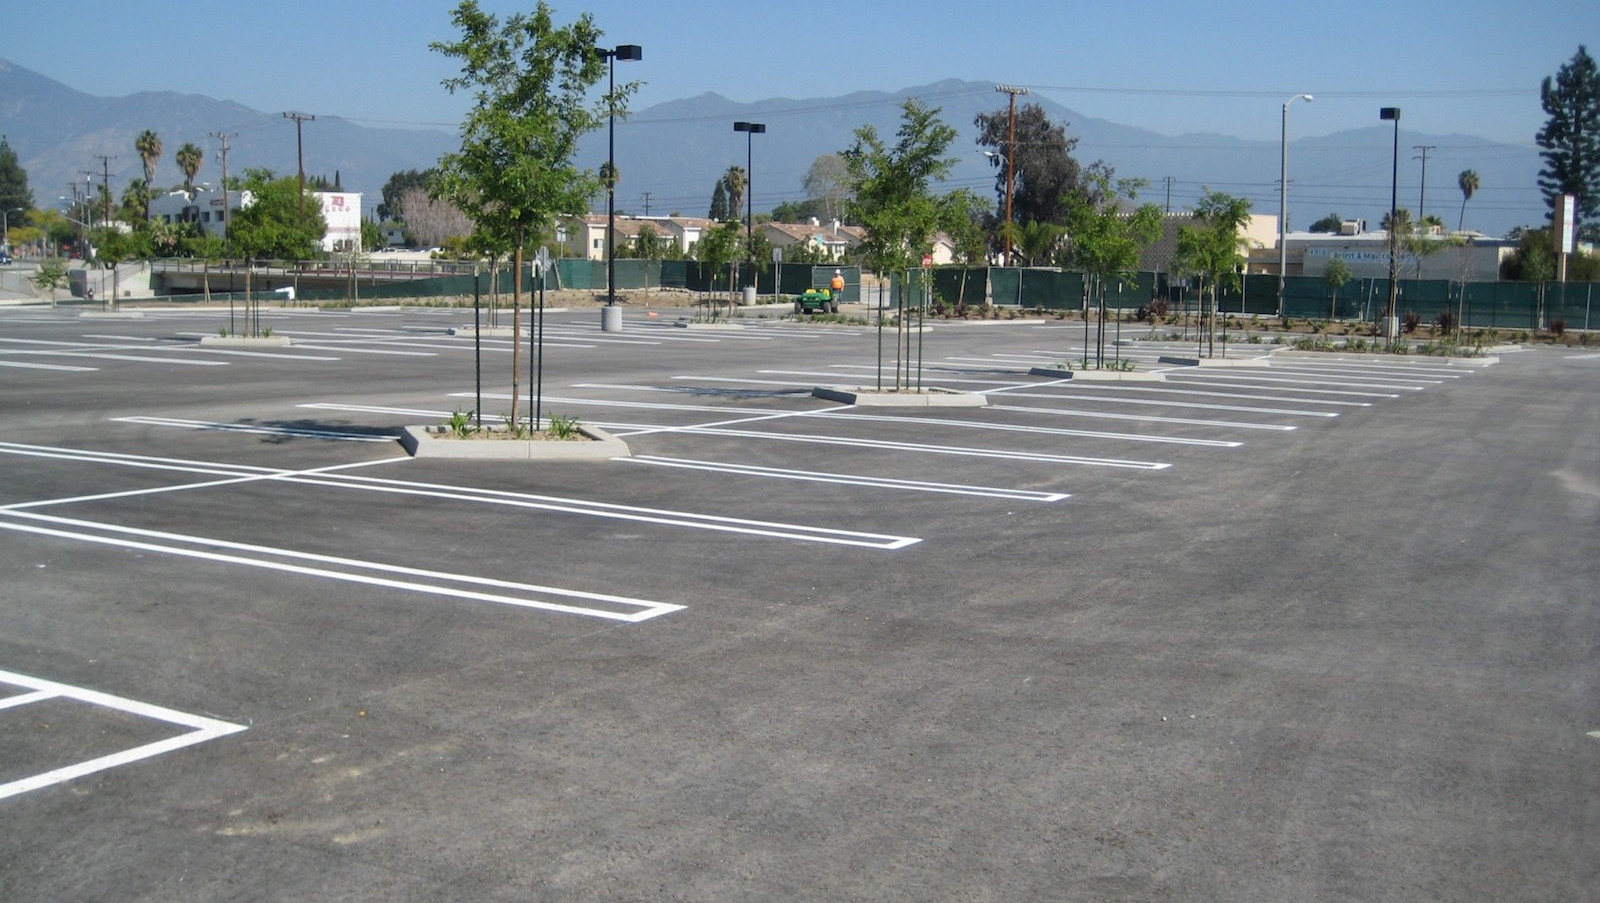 Parking Lot_7.JPG